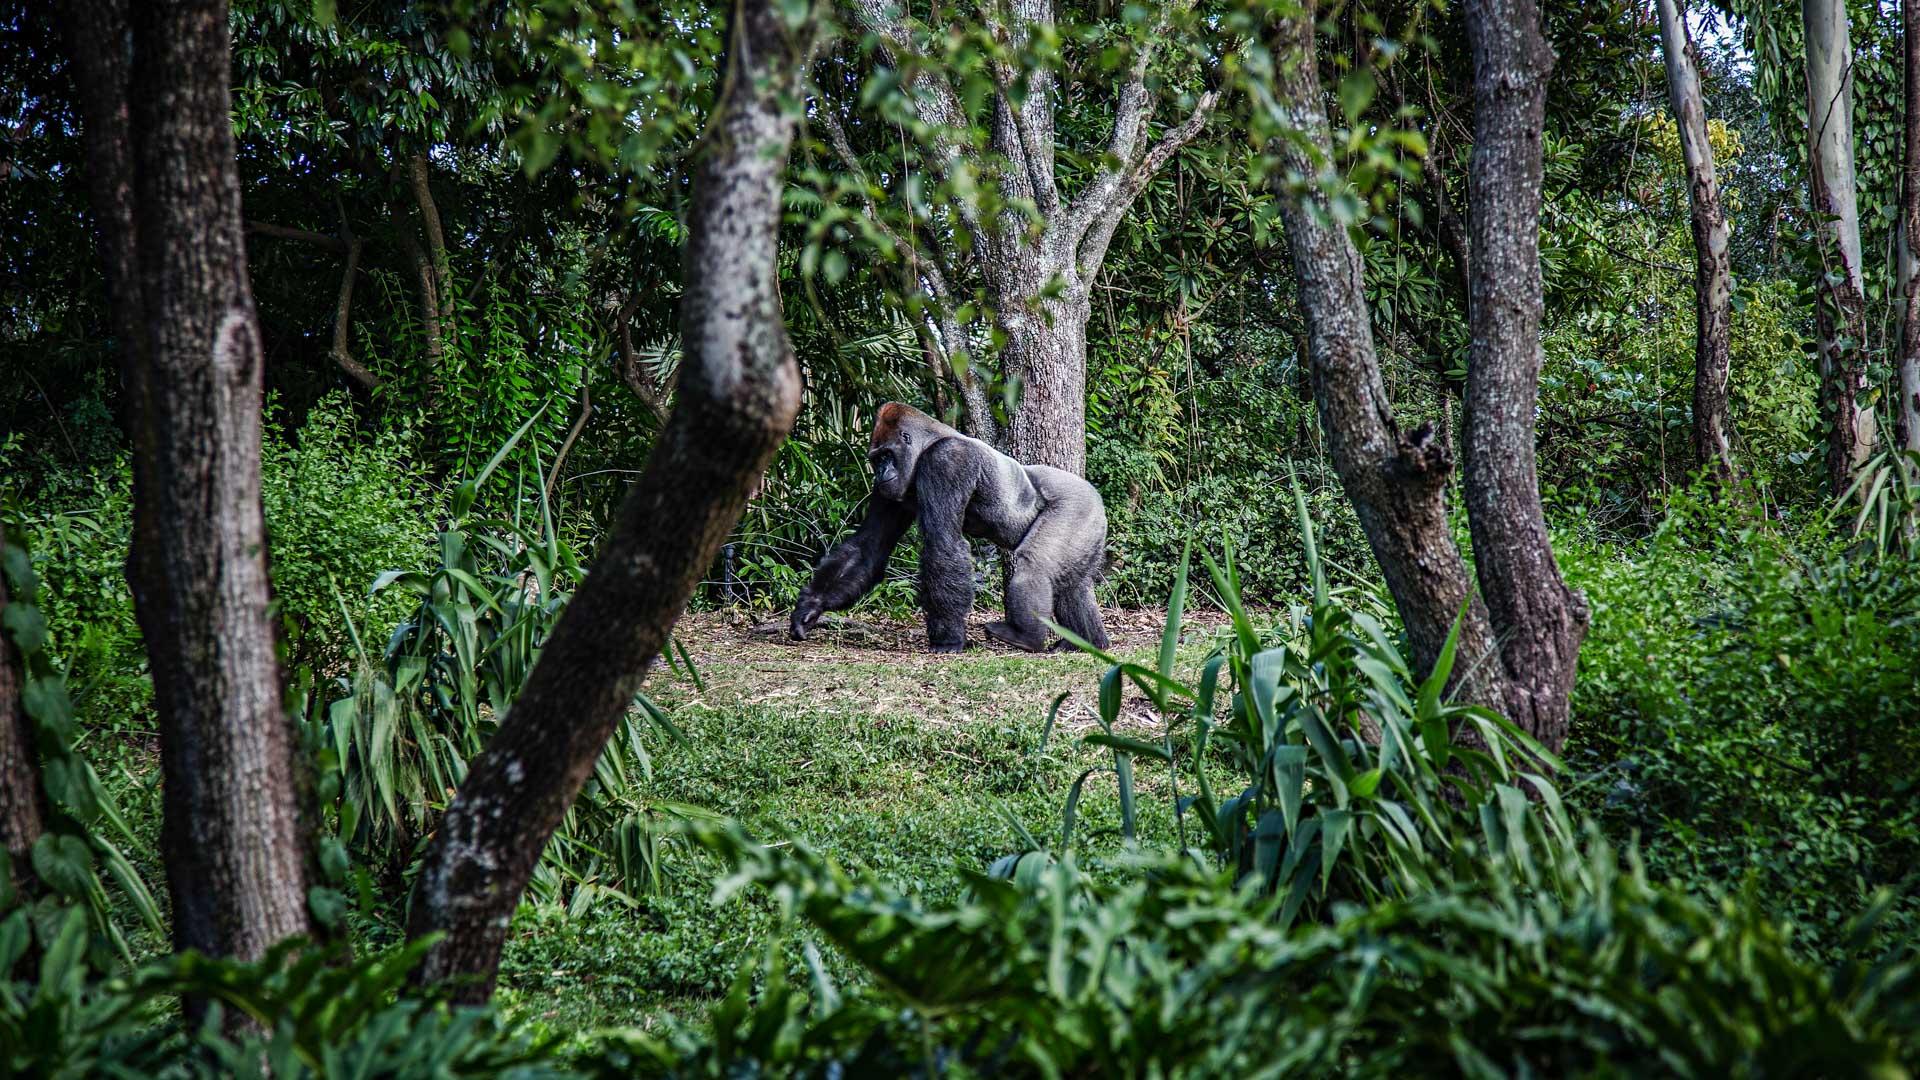 Mike Arney, Berggorillas in Uganda